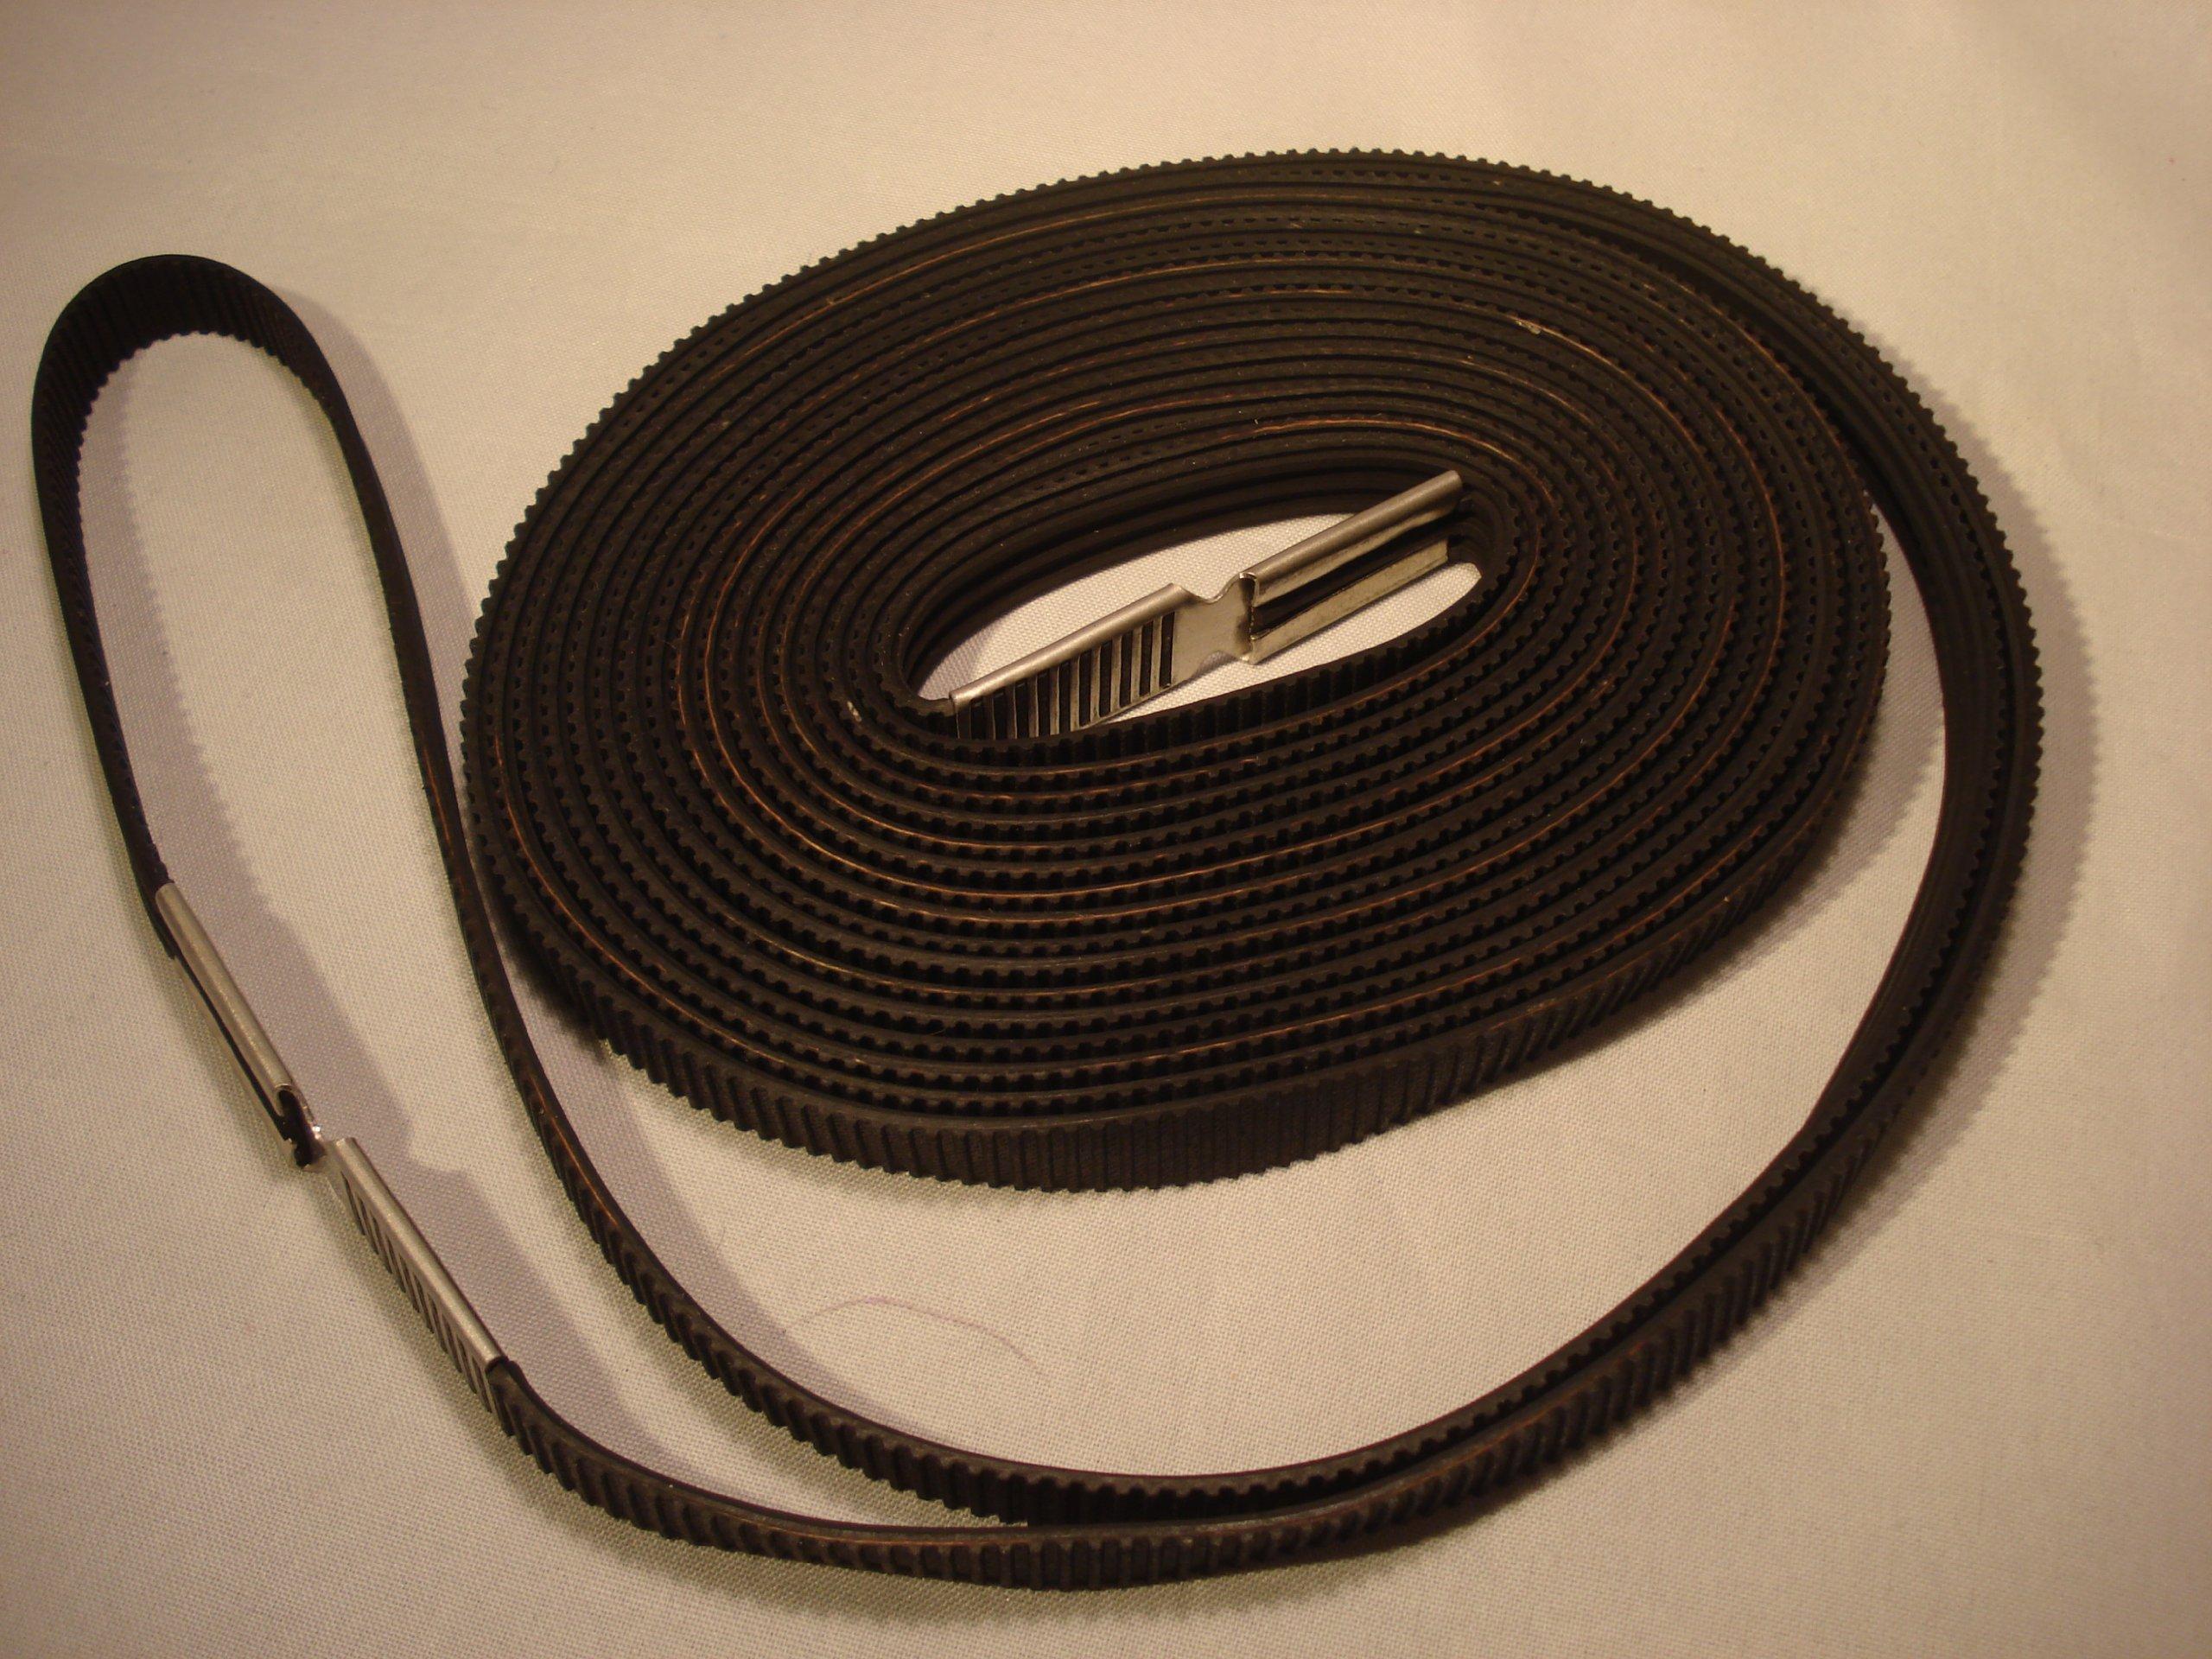 "HP Designjet 5000, 5500 carriage belt for 42"" plotters"